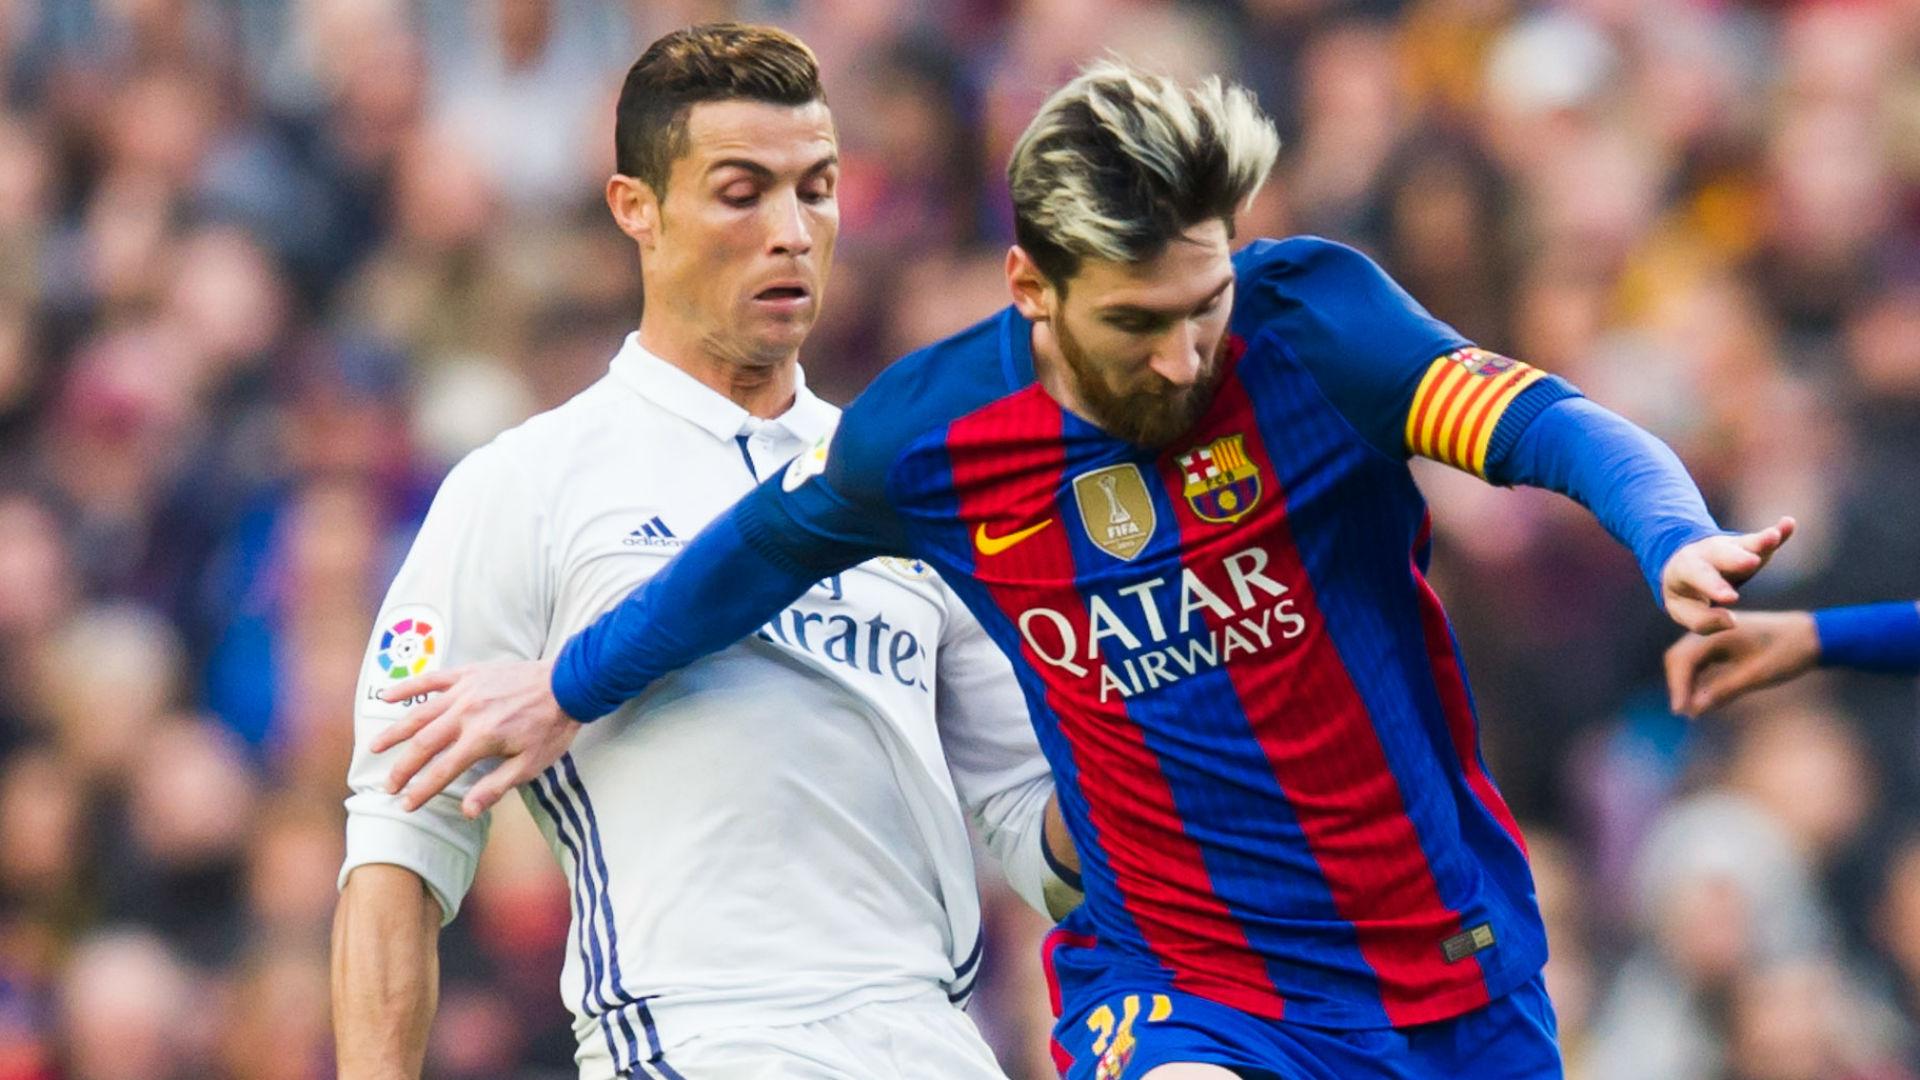 Cuadrado 'can't imagine' Messi joining Ronaldo at Juventus